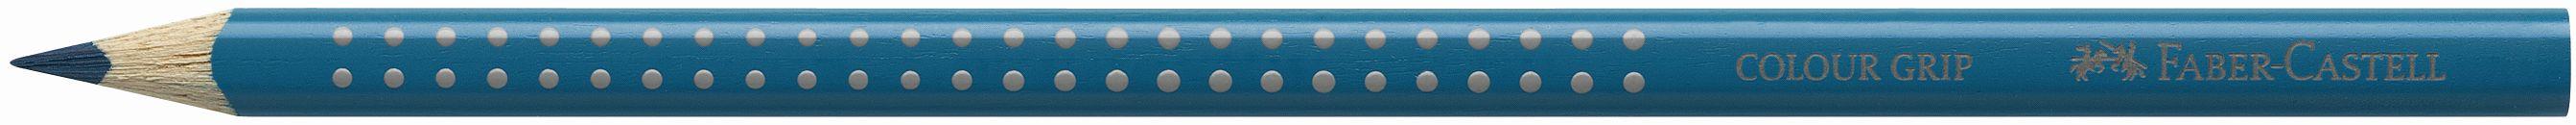 Pastelka Color Grip / 153 kobaltový tyrkys Faber Castell - Akvarelové pastelky Faber Castell - Akvarelové pastelky